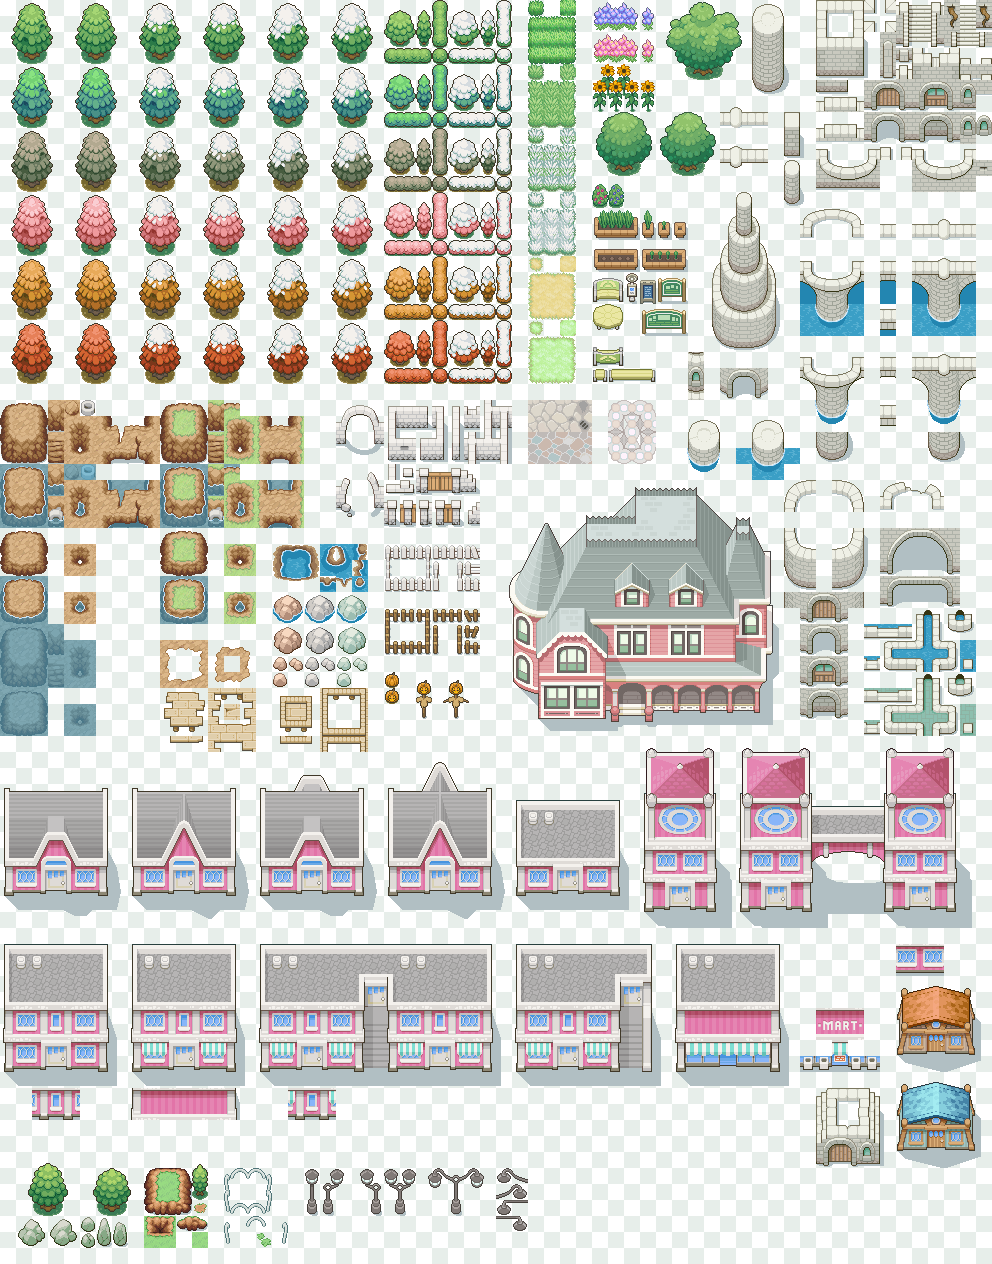 Bunch o' free tiles